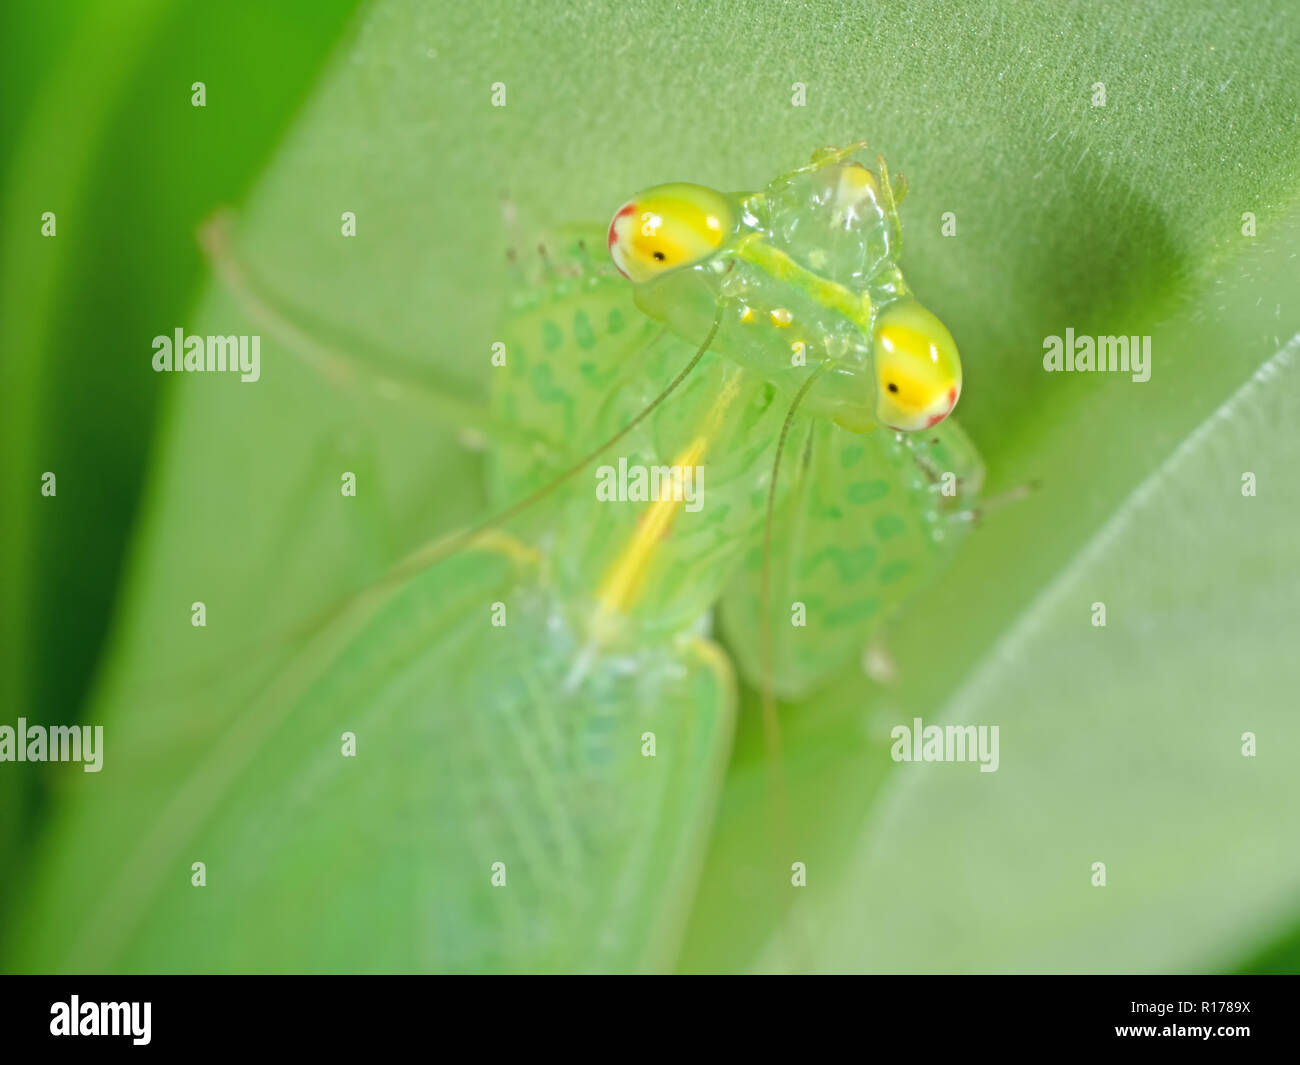 Macro Photography of Head of Praying Mantis on Green Leaf Stock Photo